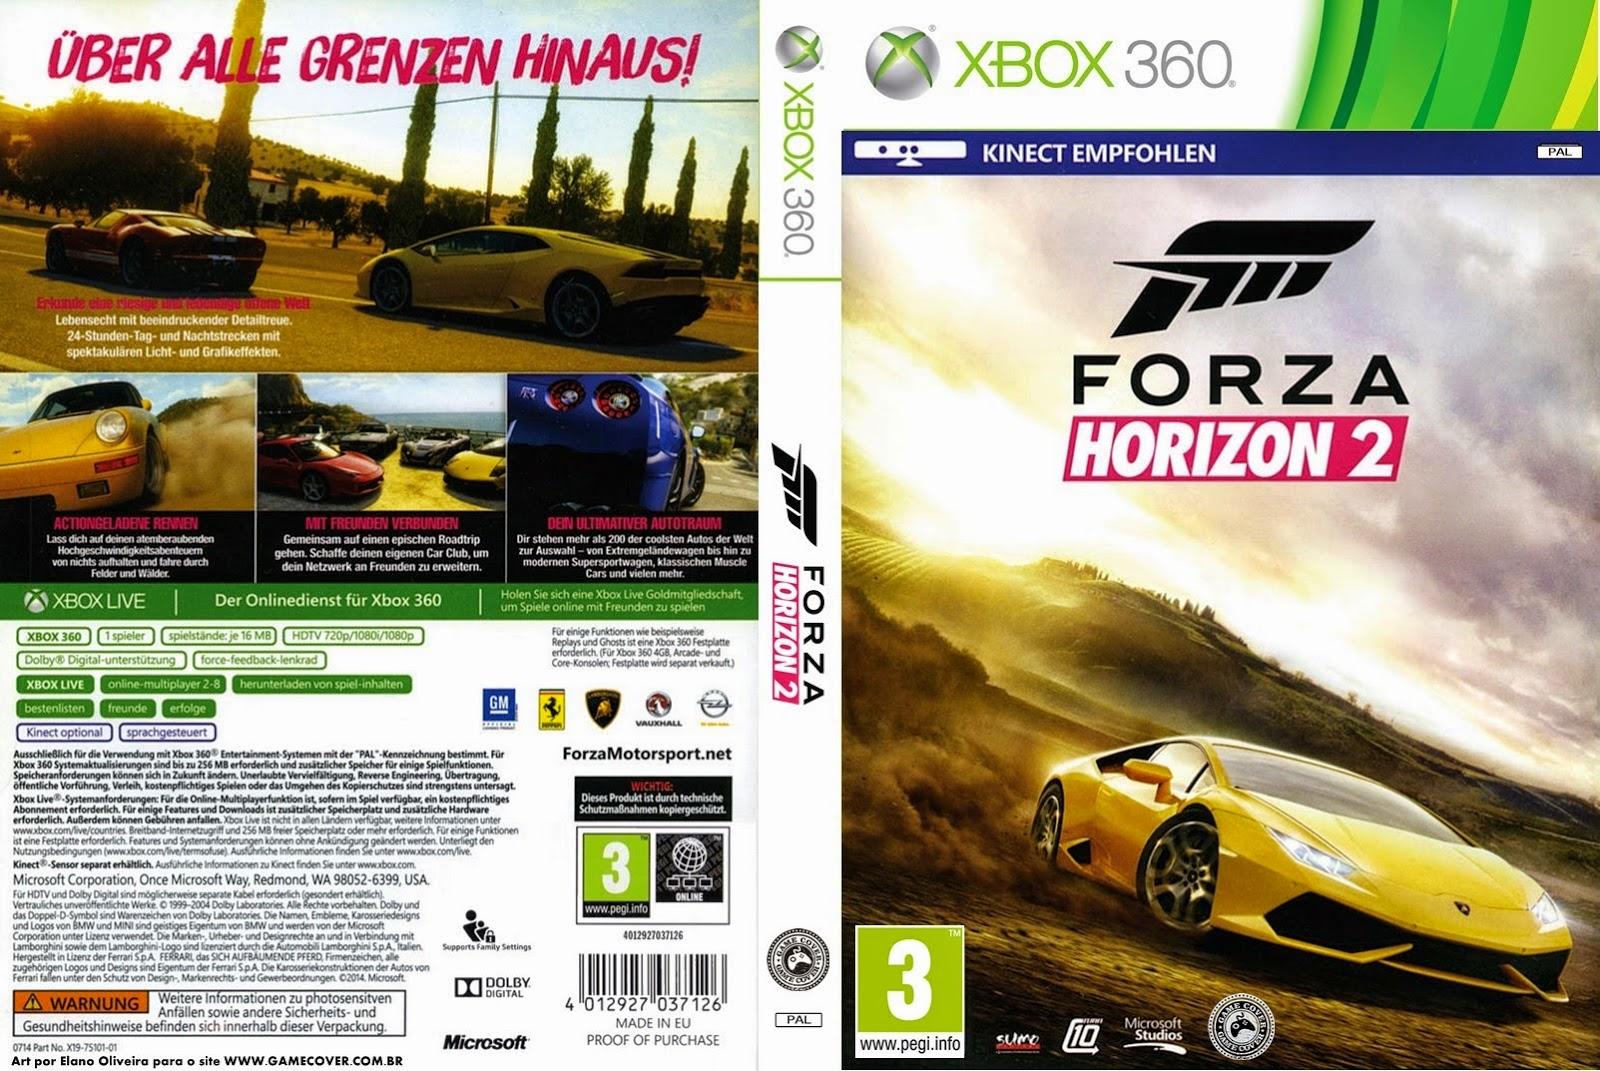 Forza Horizon 2 Demo Release Date Details